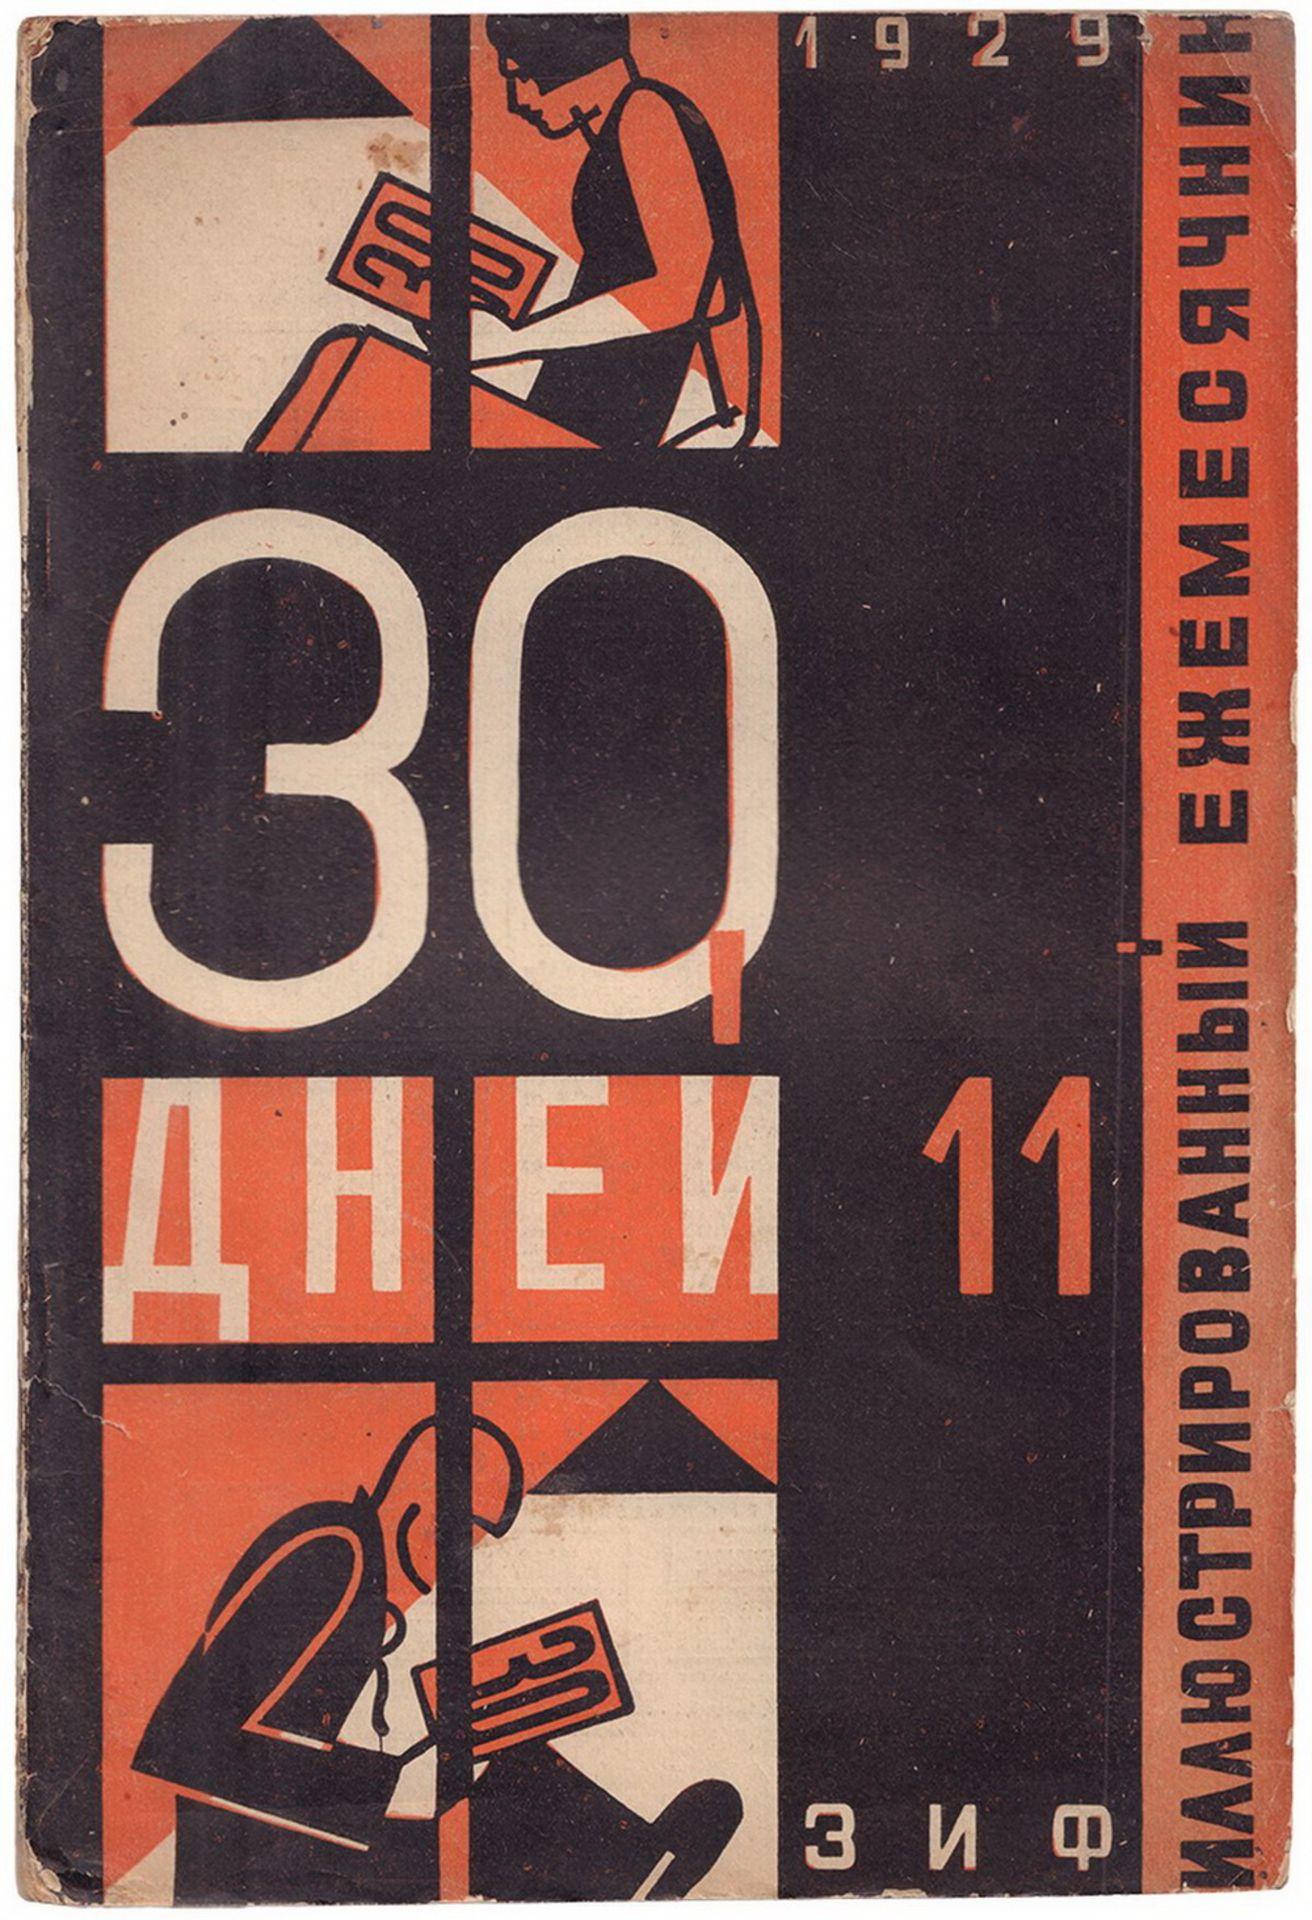 [Gustav Klutsis, photomontages. Rodchenko, A. photographs. Soviet art]. 30 days: Magazine. Issue 11t